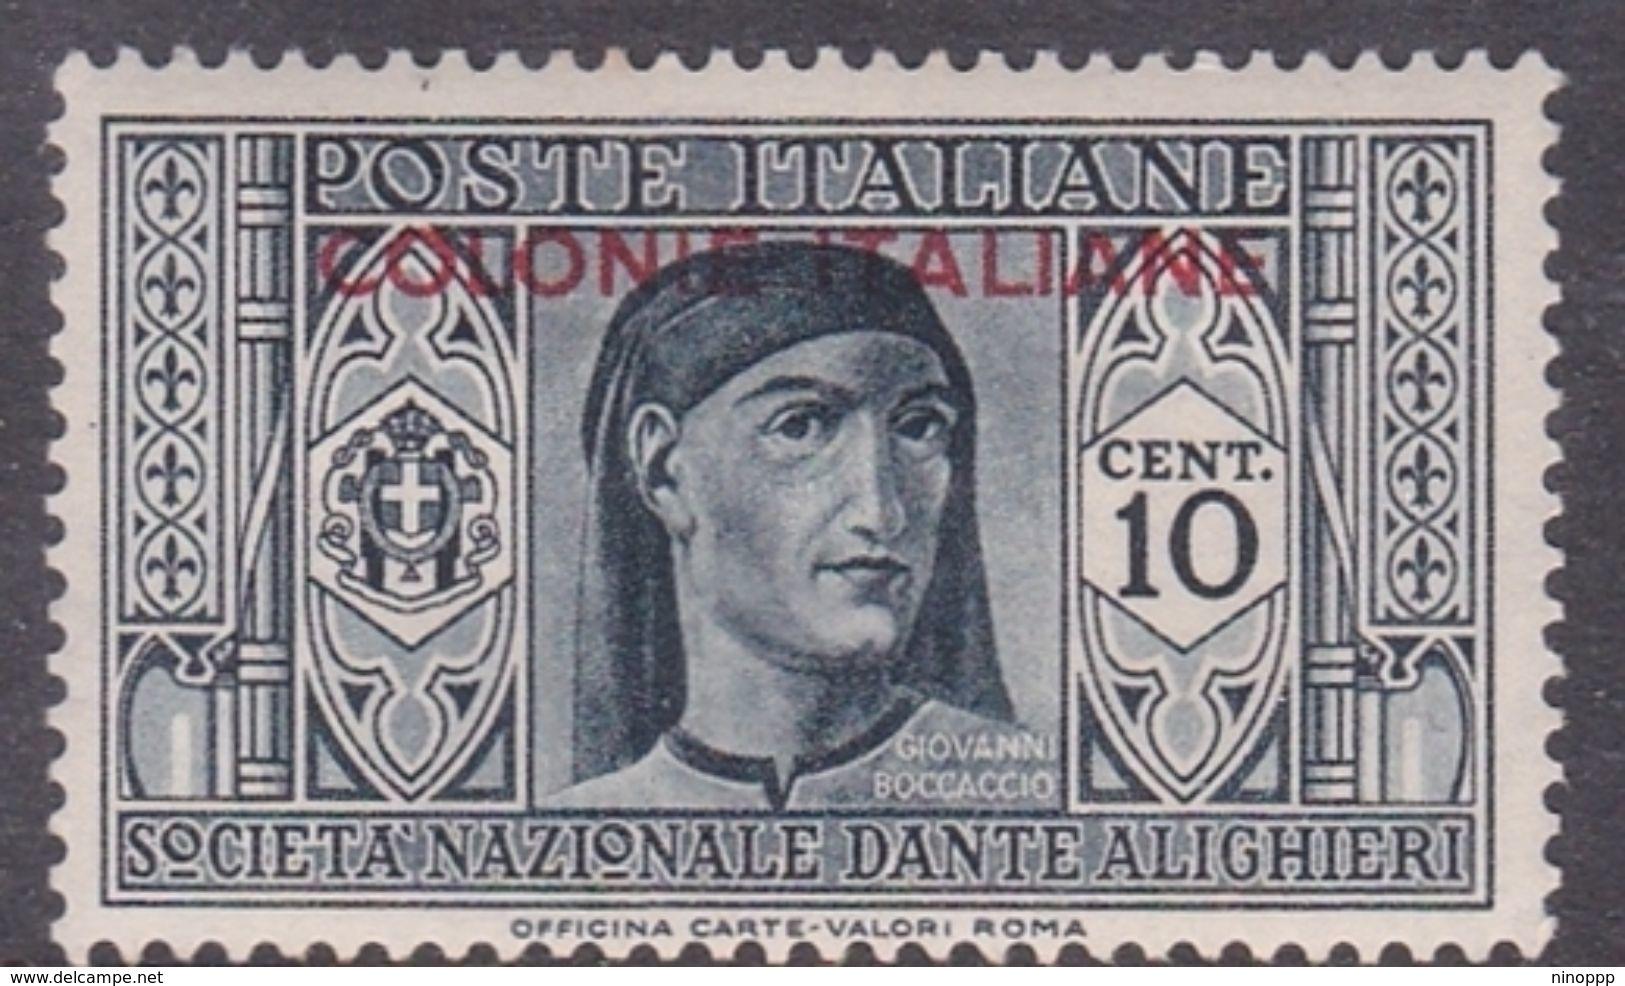 Italy-Colonies And Territories-General Issue S11 1932 Dante Alighieri 10c Dark Gray MH - Italy